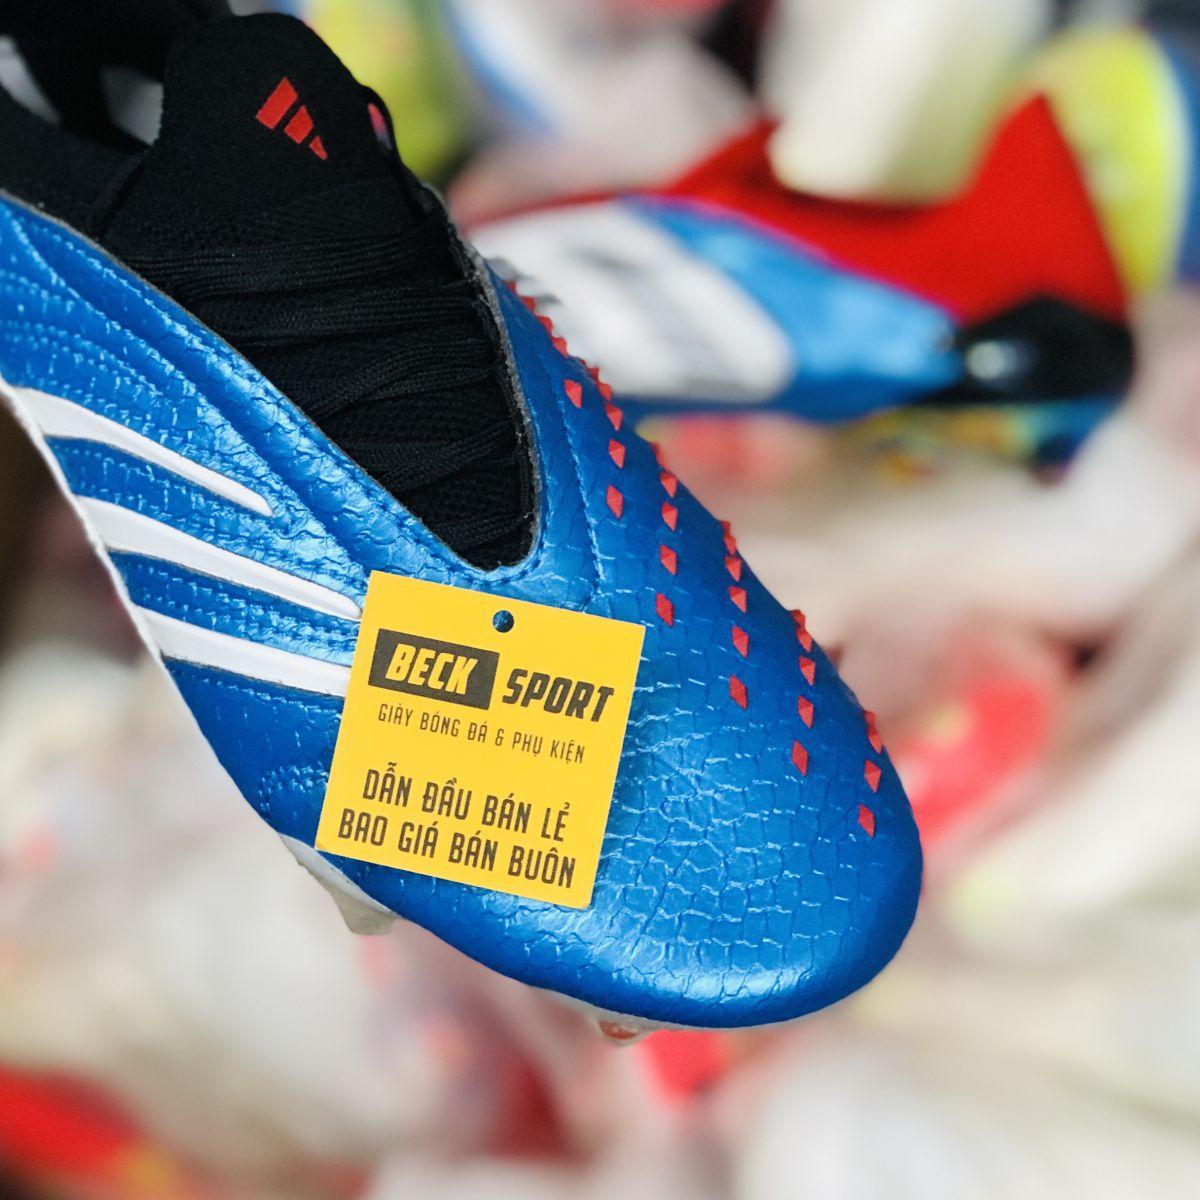 Giày Bóng Đá Adidas Predator 20 Archive Xanh Biển Limited Editon FG